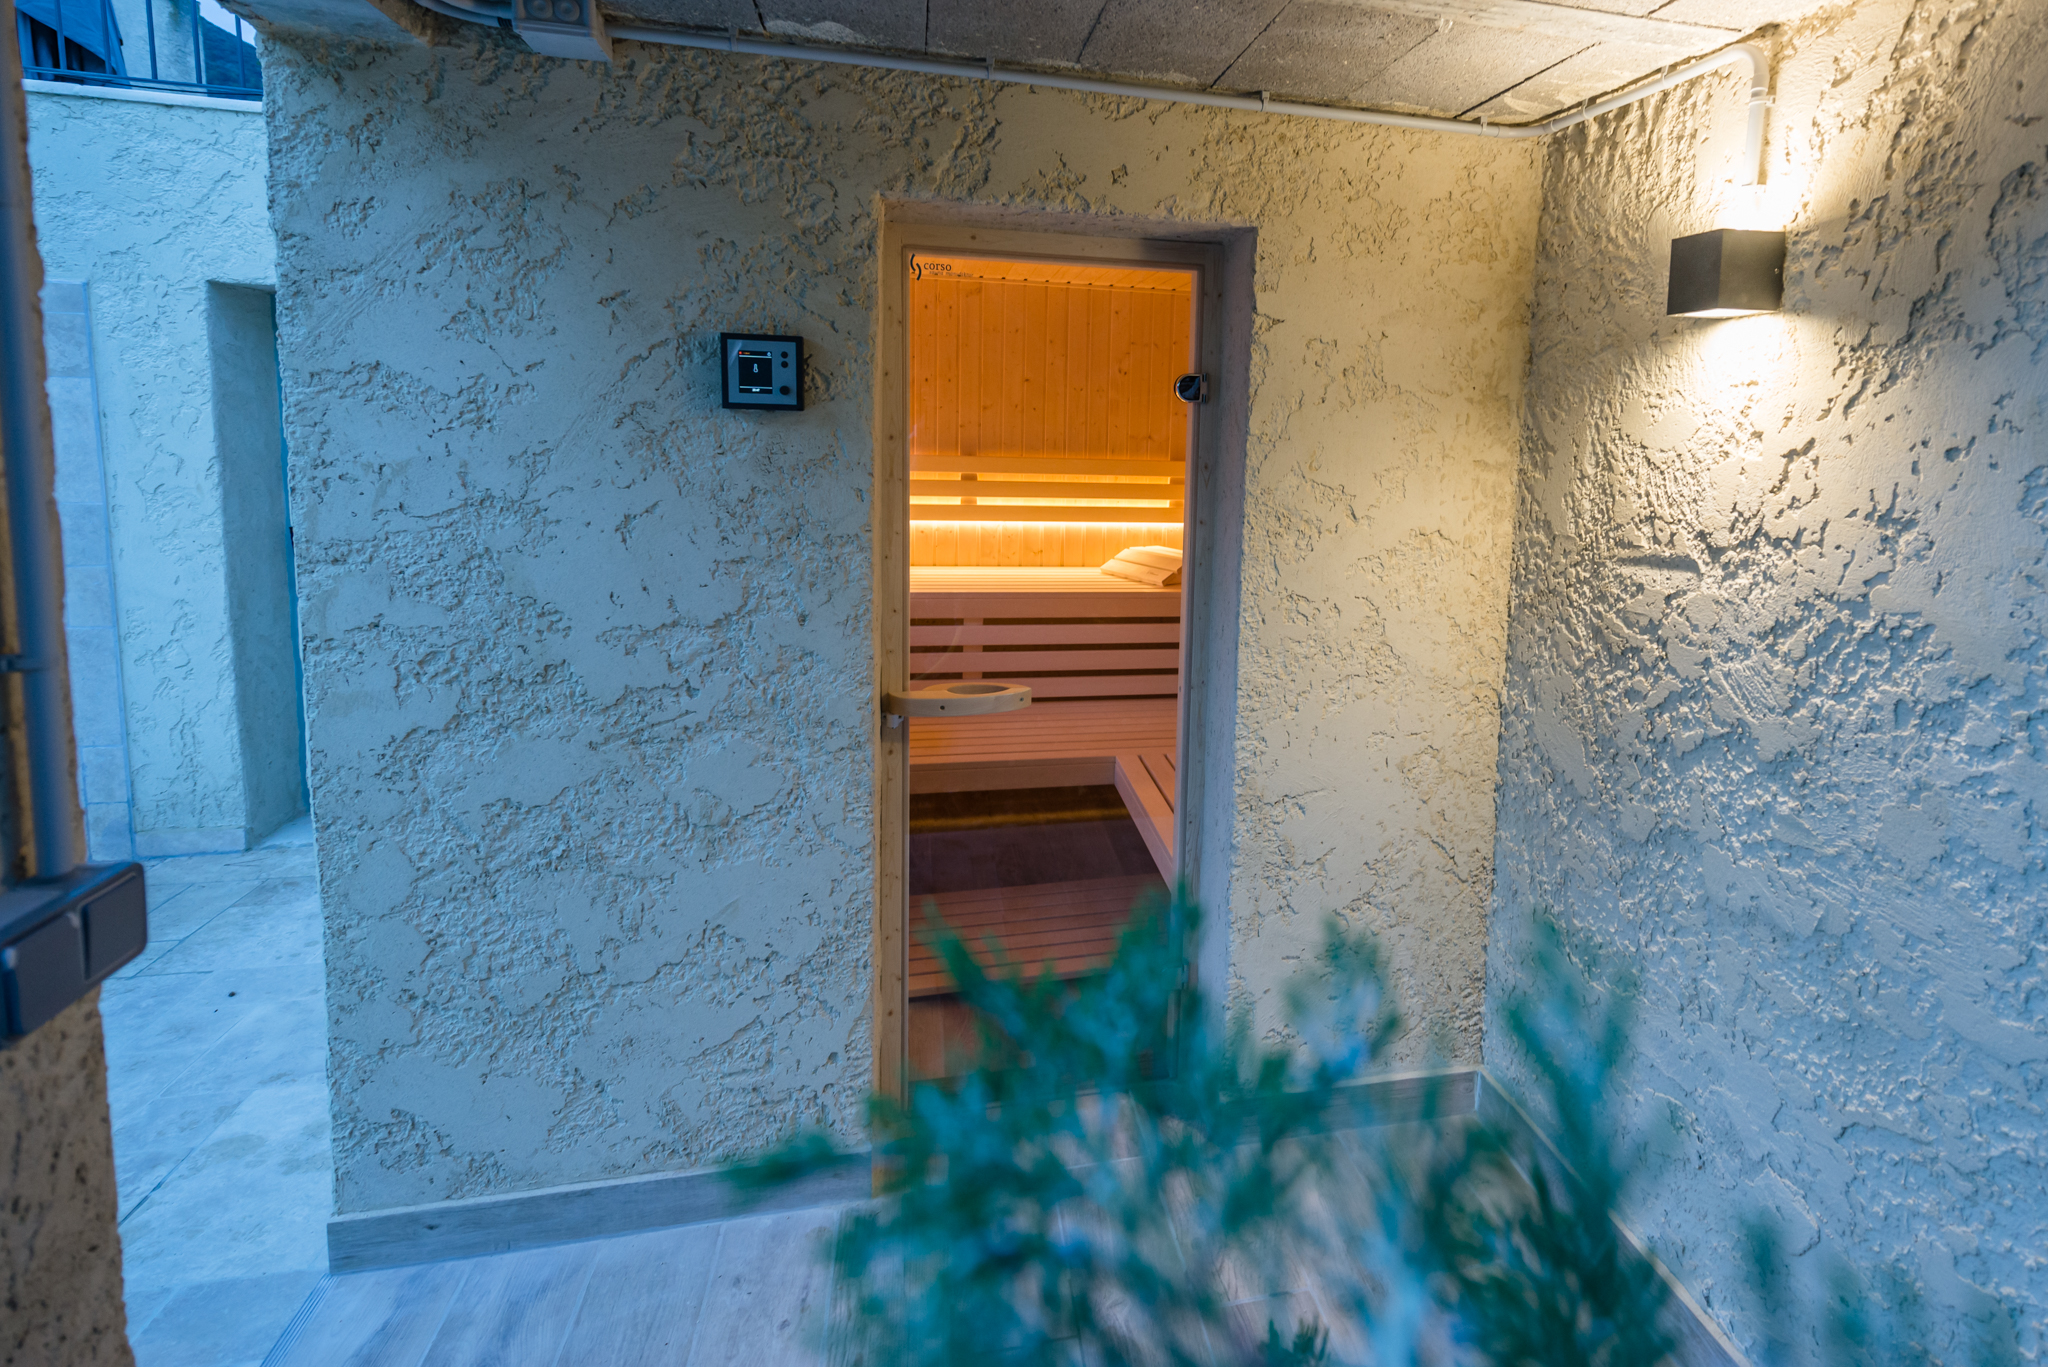 feriebolig-frankrig-sauna-pool-DSC_4834.jpg